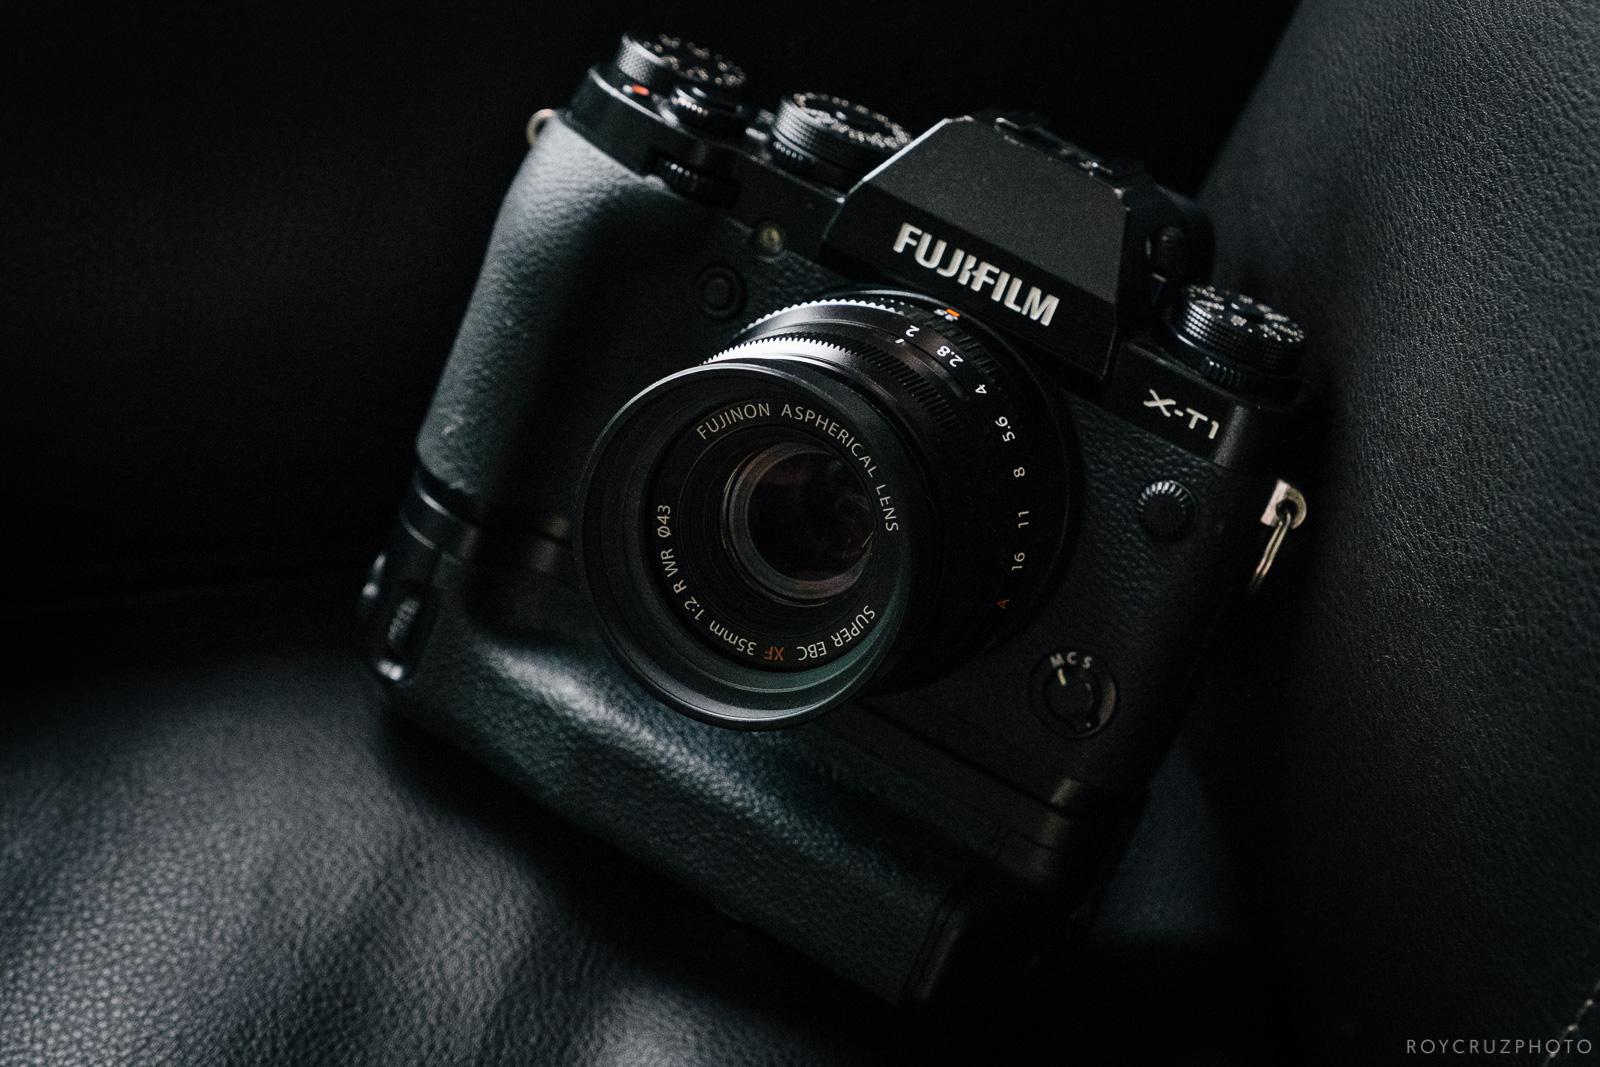 My Favorite Street Portrait Lens: the Fujinon XF 35mm f/2 WR